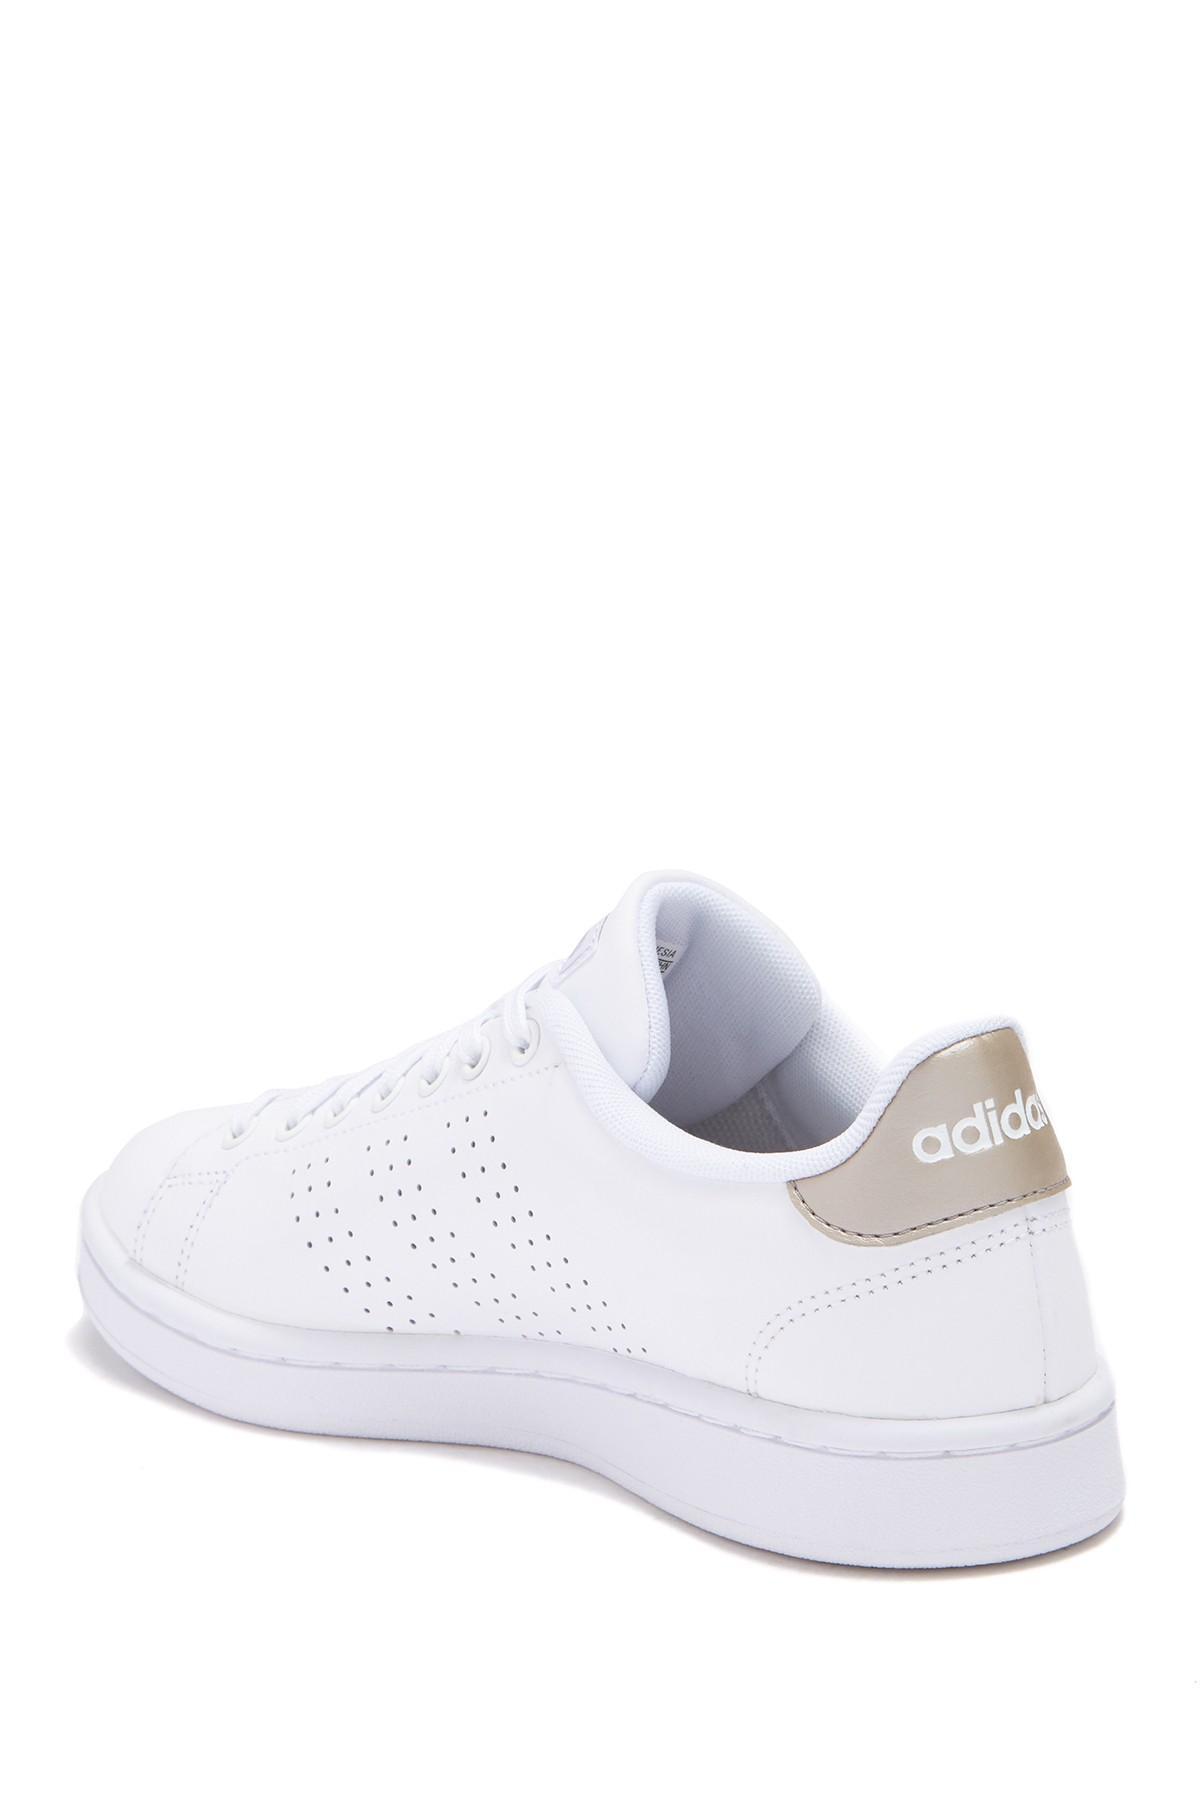 f2e298864 Lyst - adidas Advantage Lace-up Sneaker in White